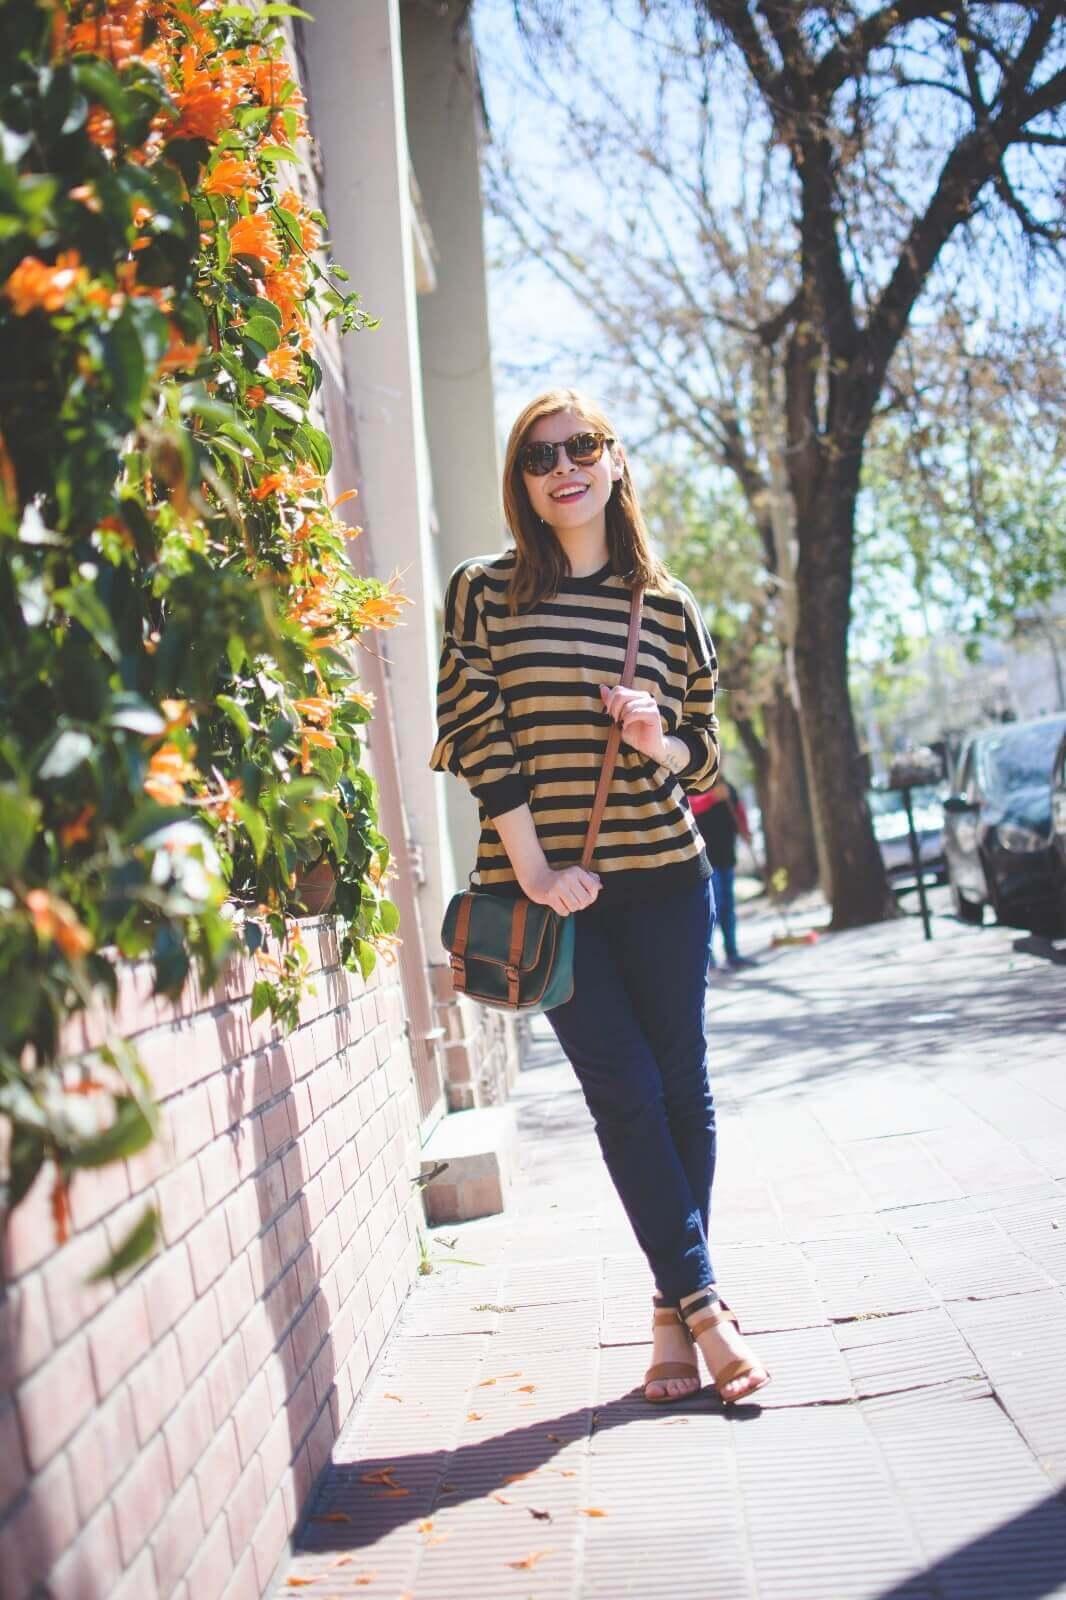 sammydress-block-heel-sandals-leopard-frame-light-brown-sammydress-sunglasses-deborah-ferrero-style-by-deb-streetstyle-salta-striped-sweater-fall2016-trends07